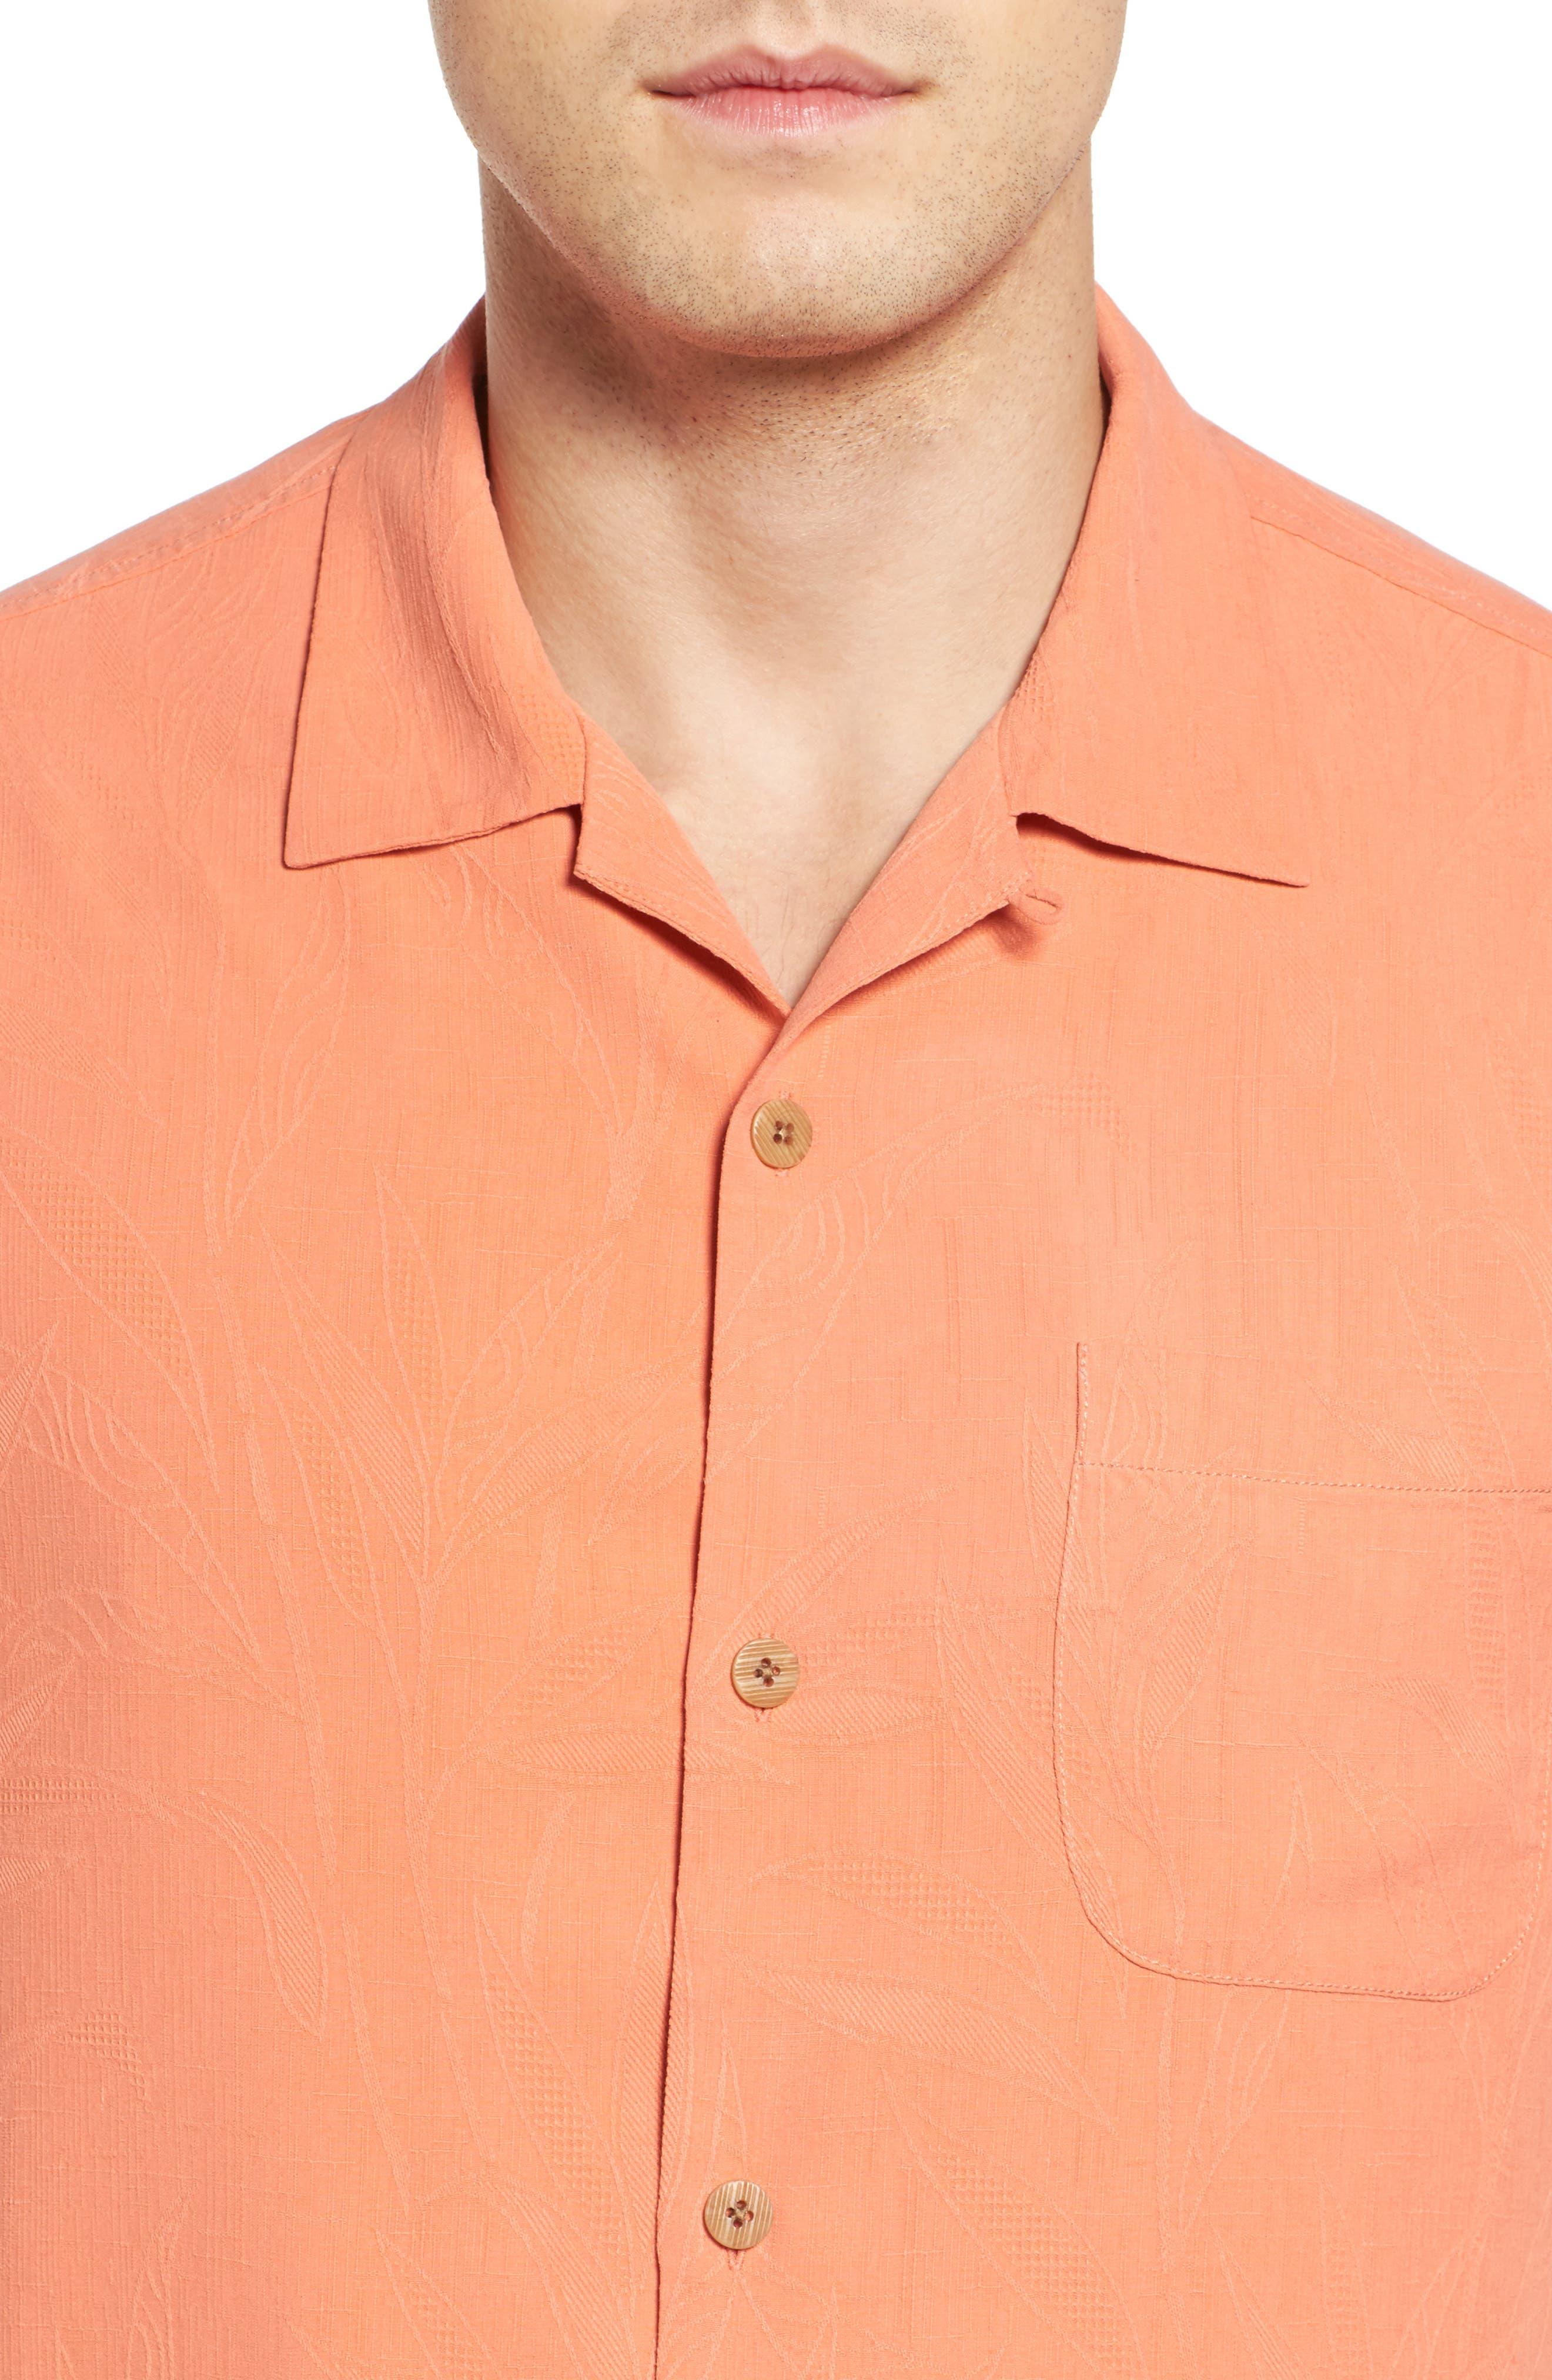 Islander Fronds Silk Camp Shirt,                             Alternate thumbnail 36, color,